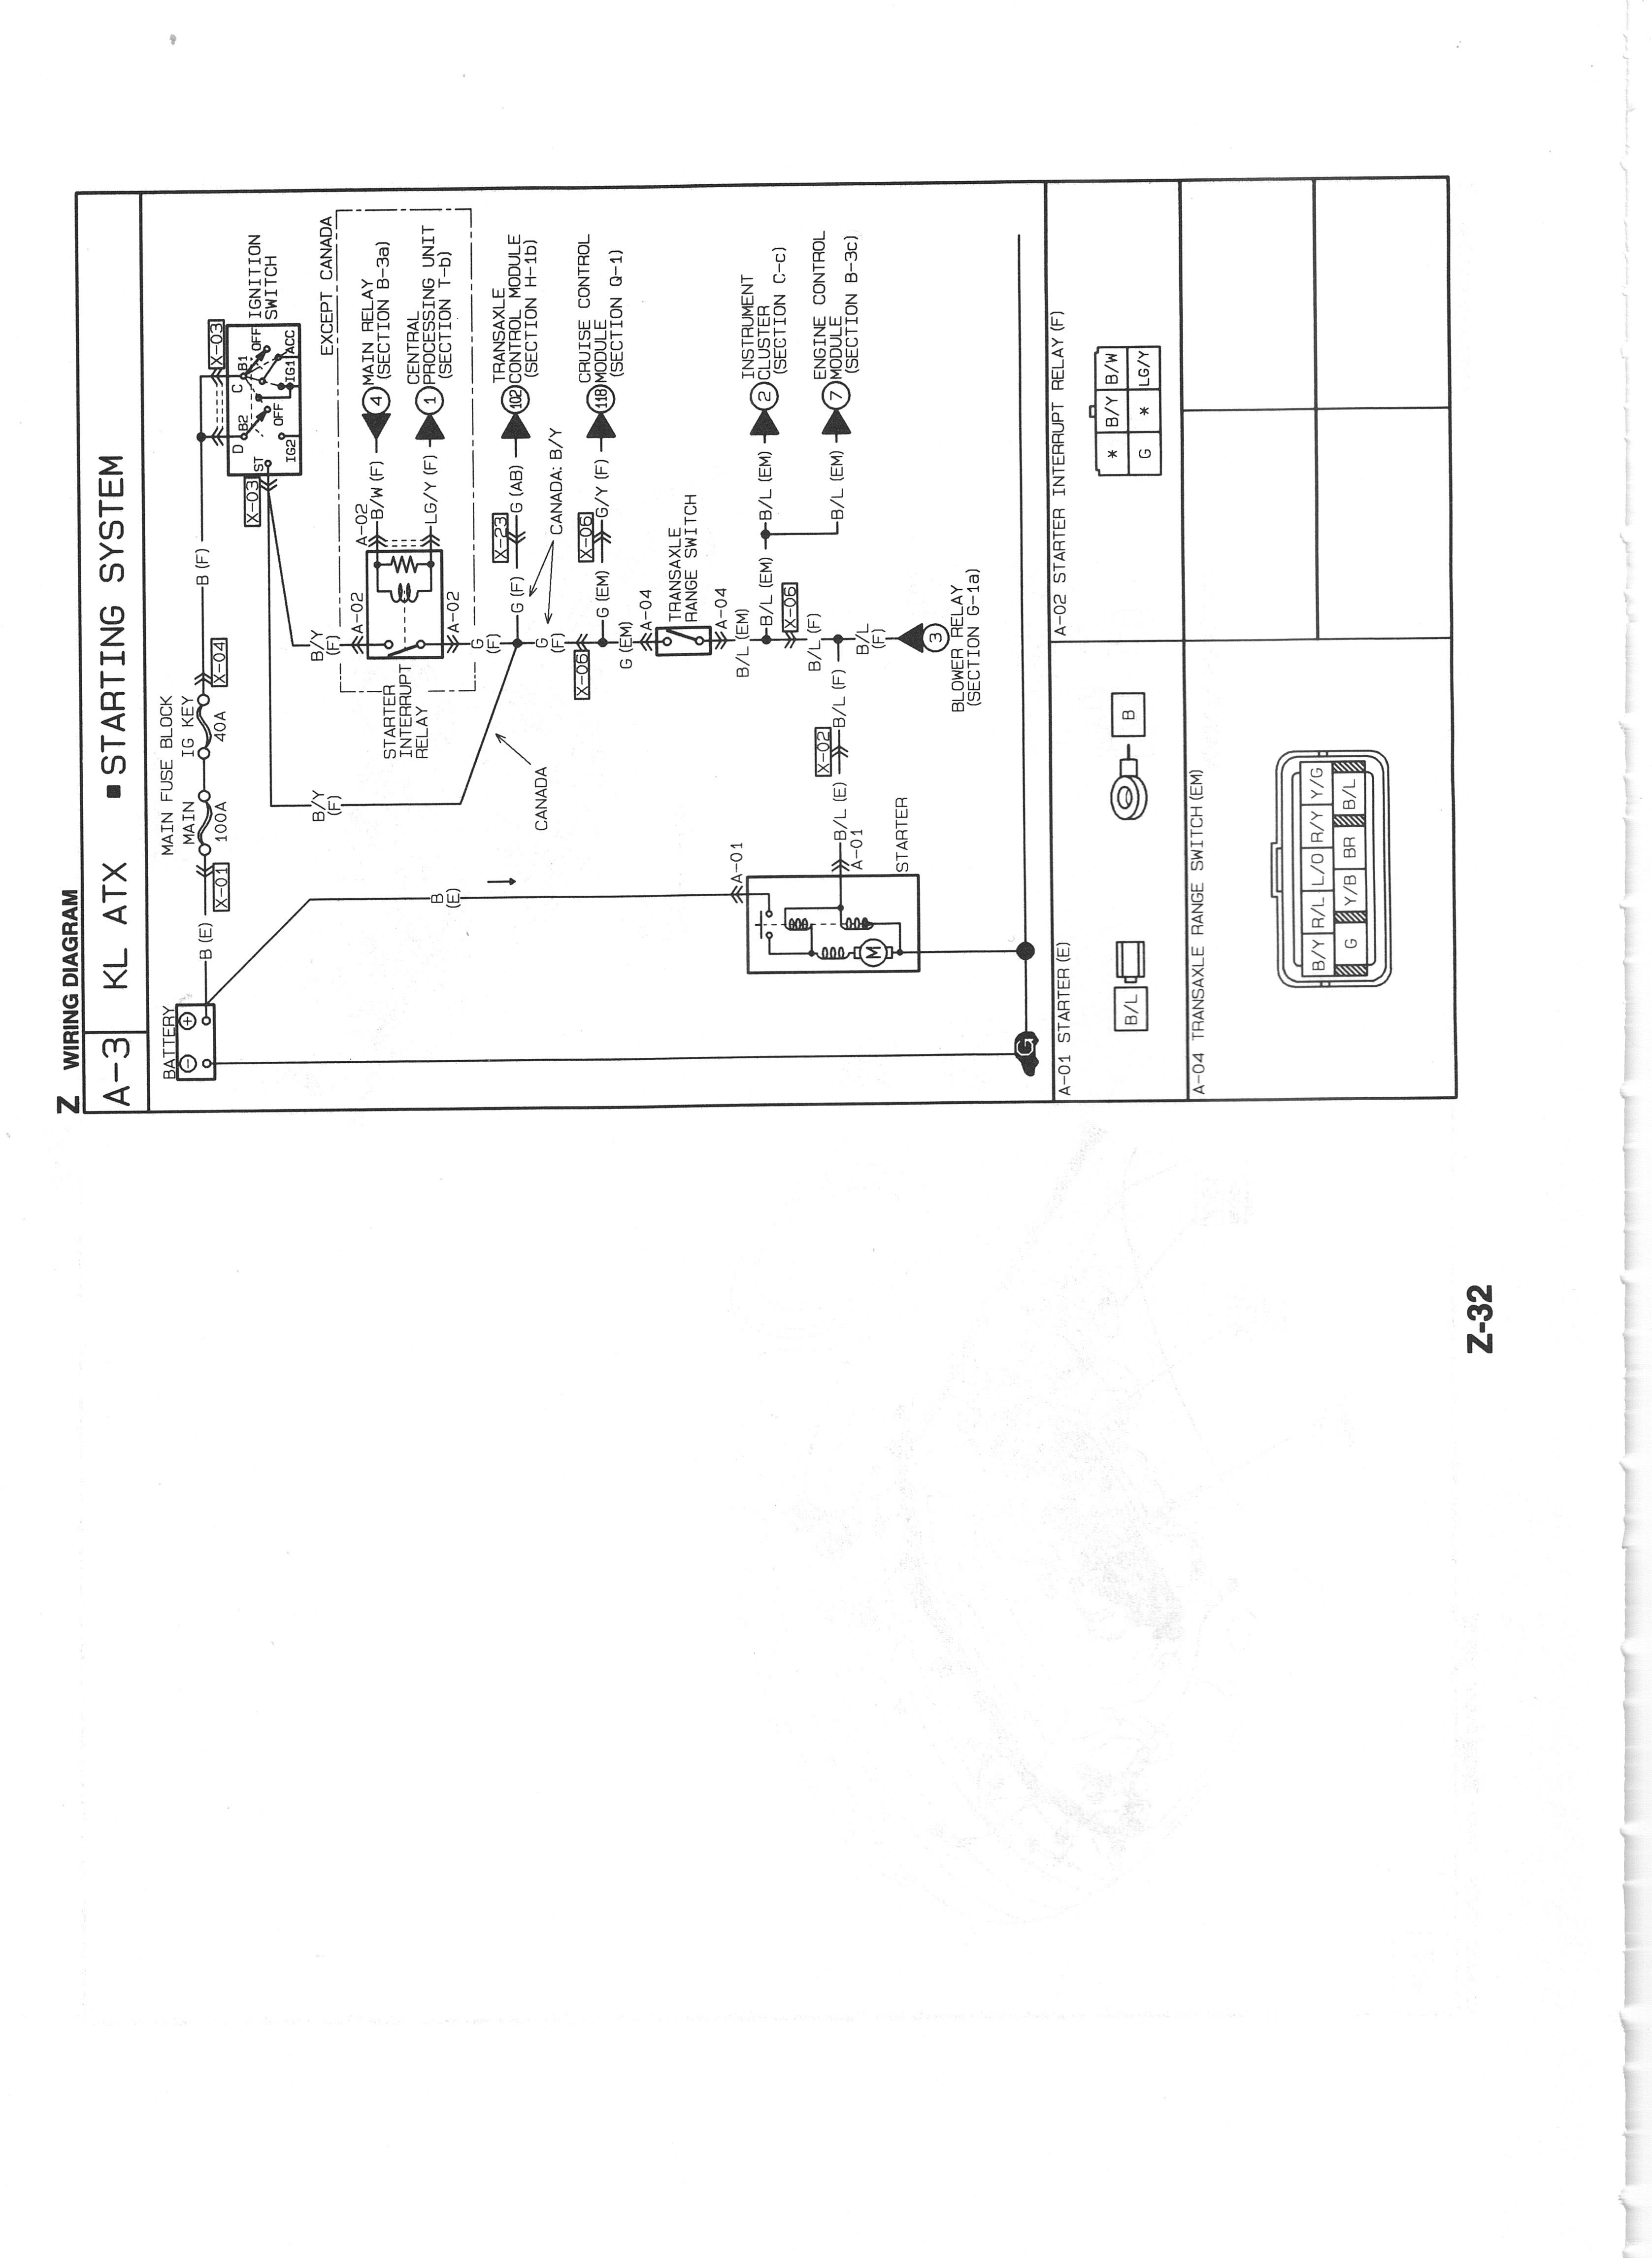 Pmx626 Info Us Mazda 626 Mx 6 Work Shop Manuals Scans 1995 Wiring Diagram